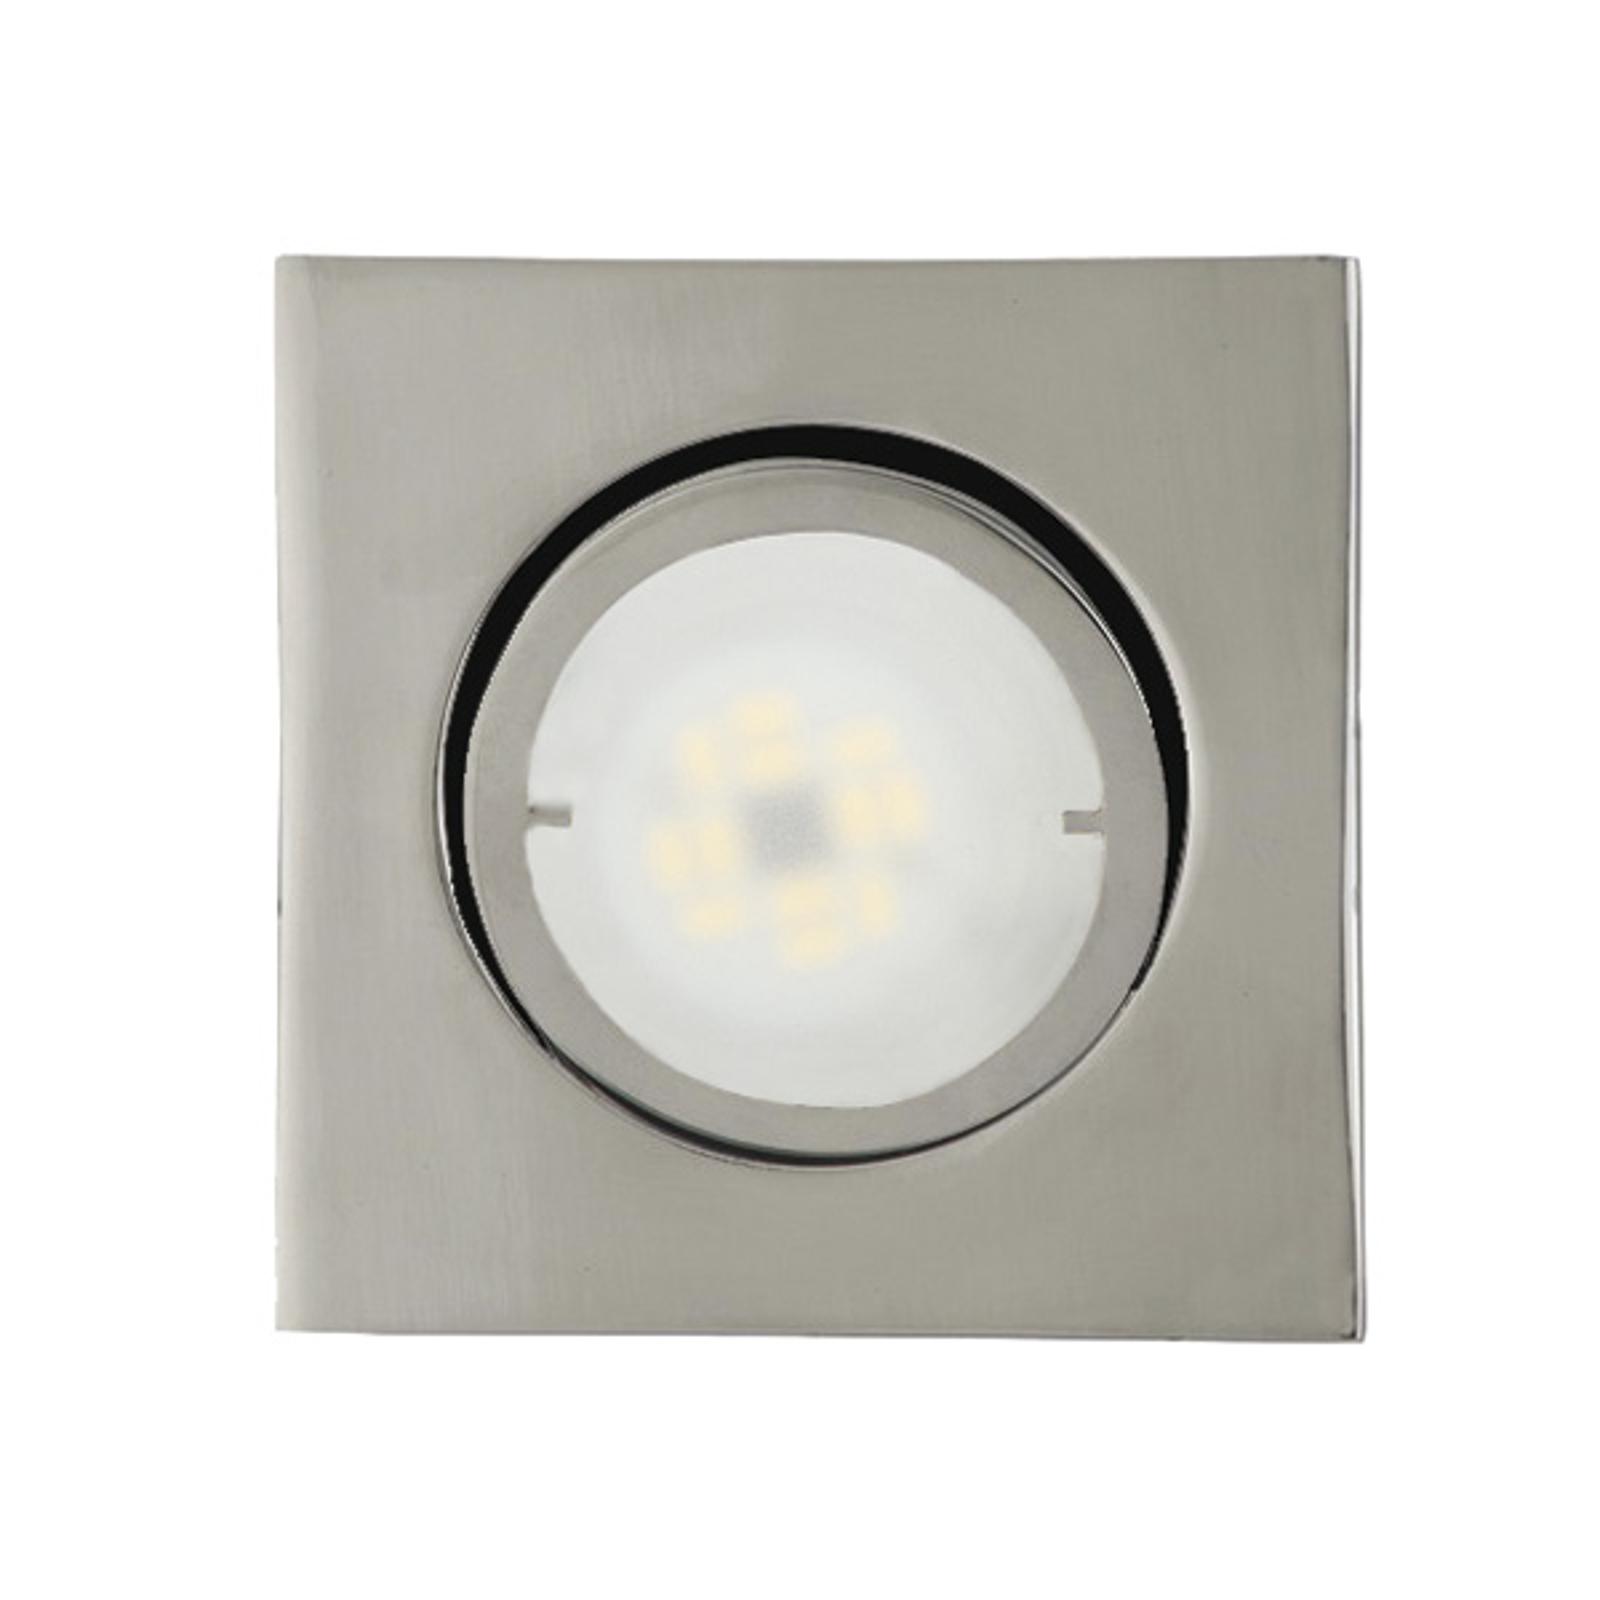 Acquista Spot LED incasso Joanie, angolare, cromo